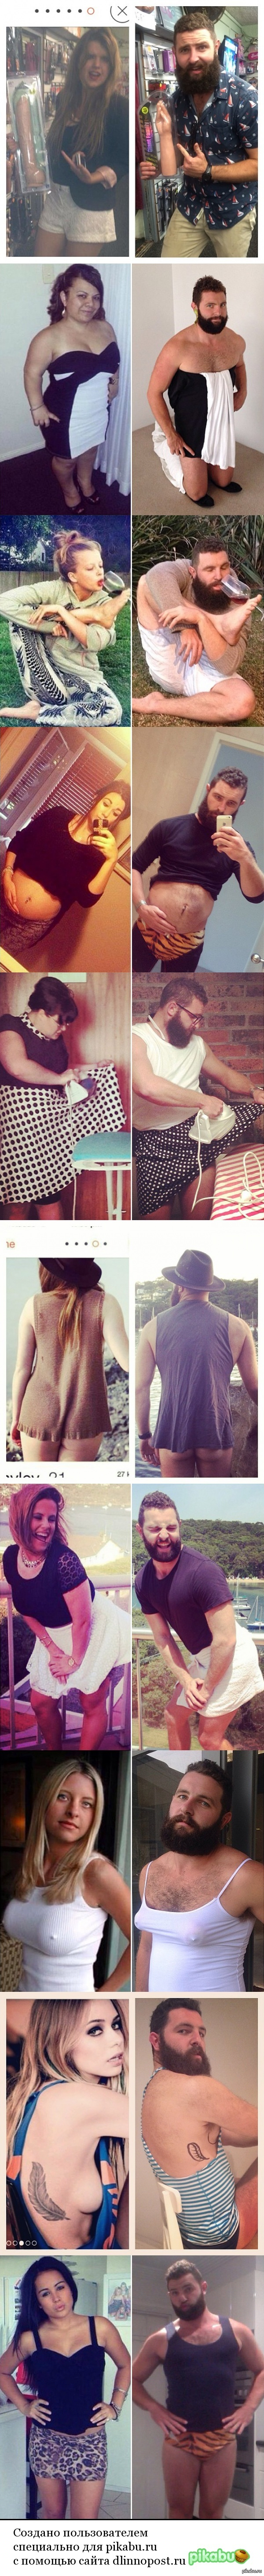 ���������� ������� ����� ���������� ���������� ������� ������� � ���������.   instagram, foto, ����, ���������, �������, ����������